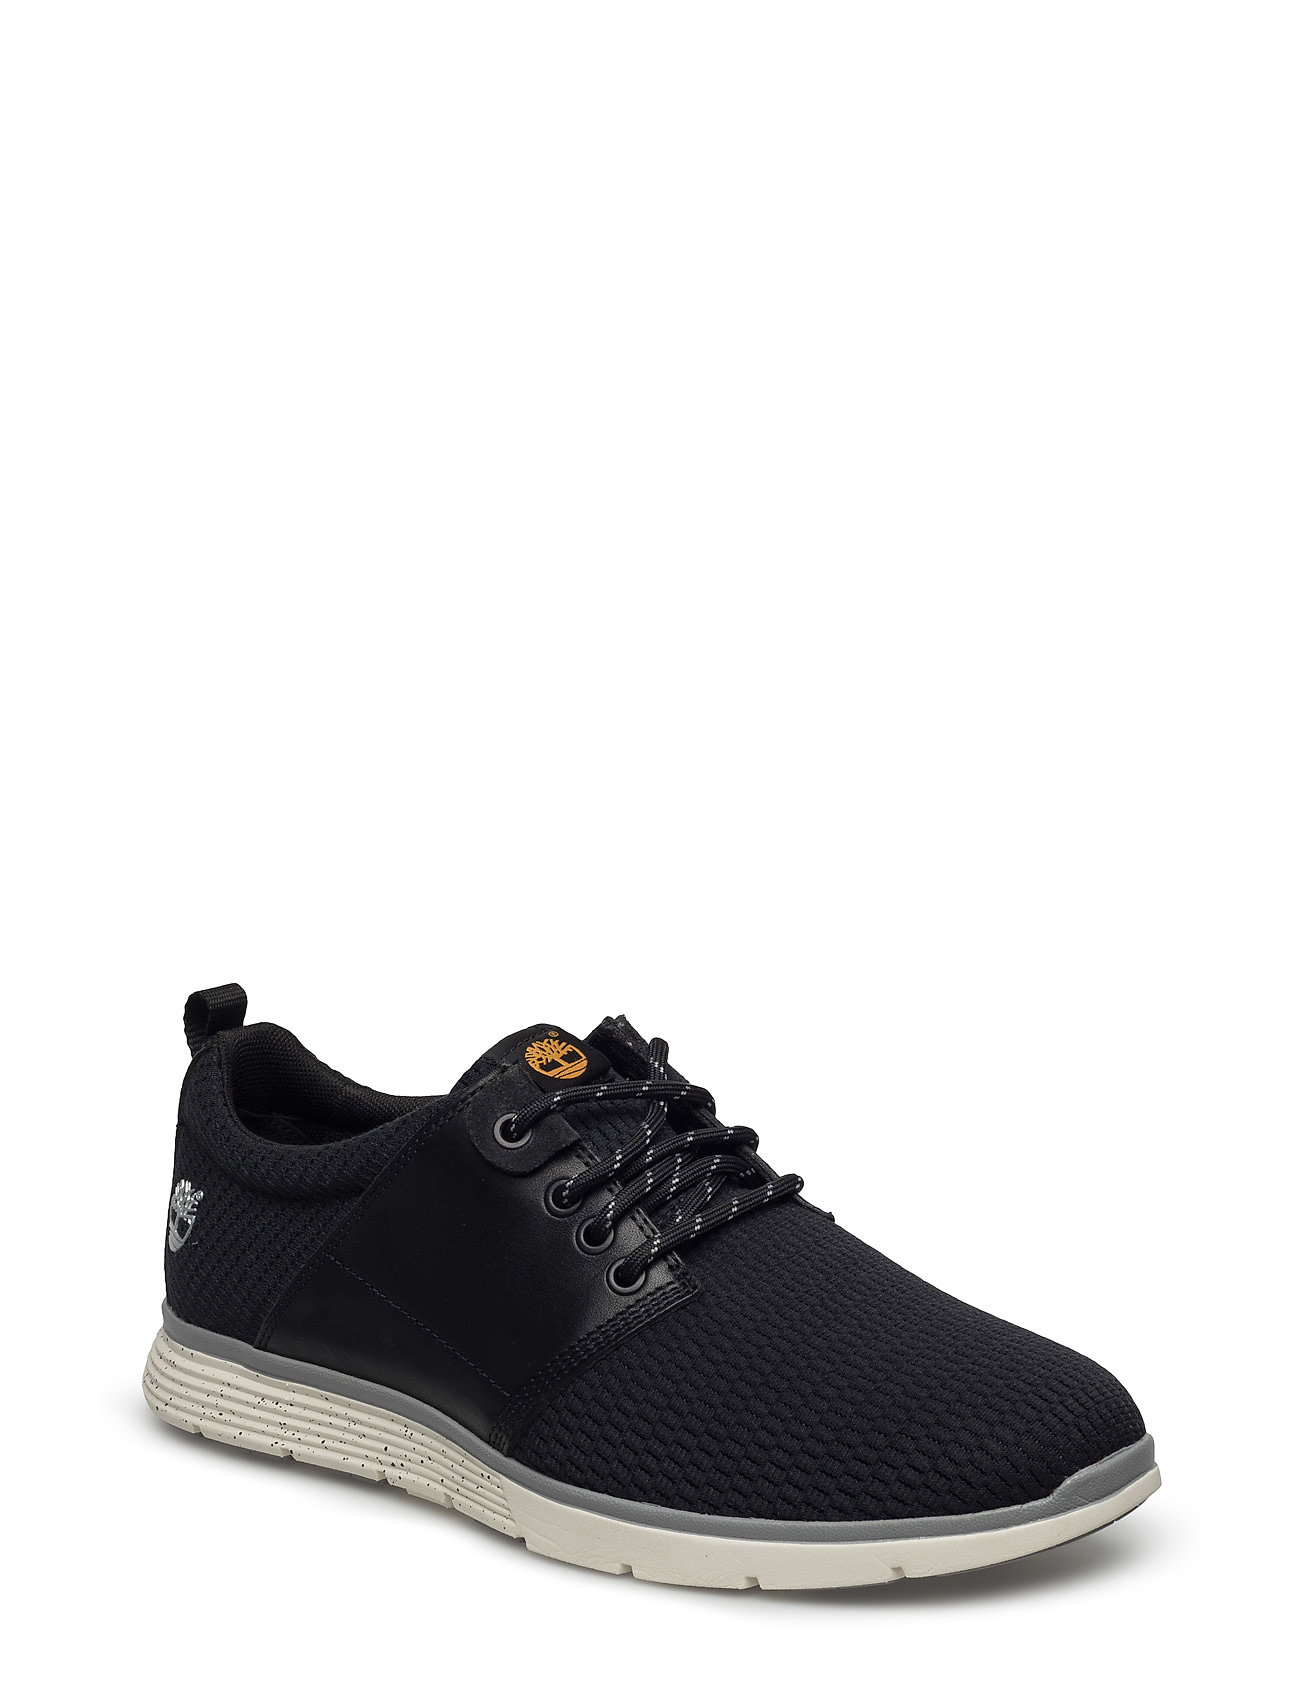 Killington L/F Oxford Timberland Sneakers til Herrer i Sort